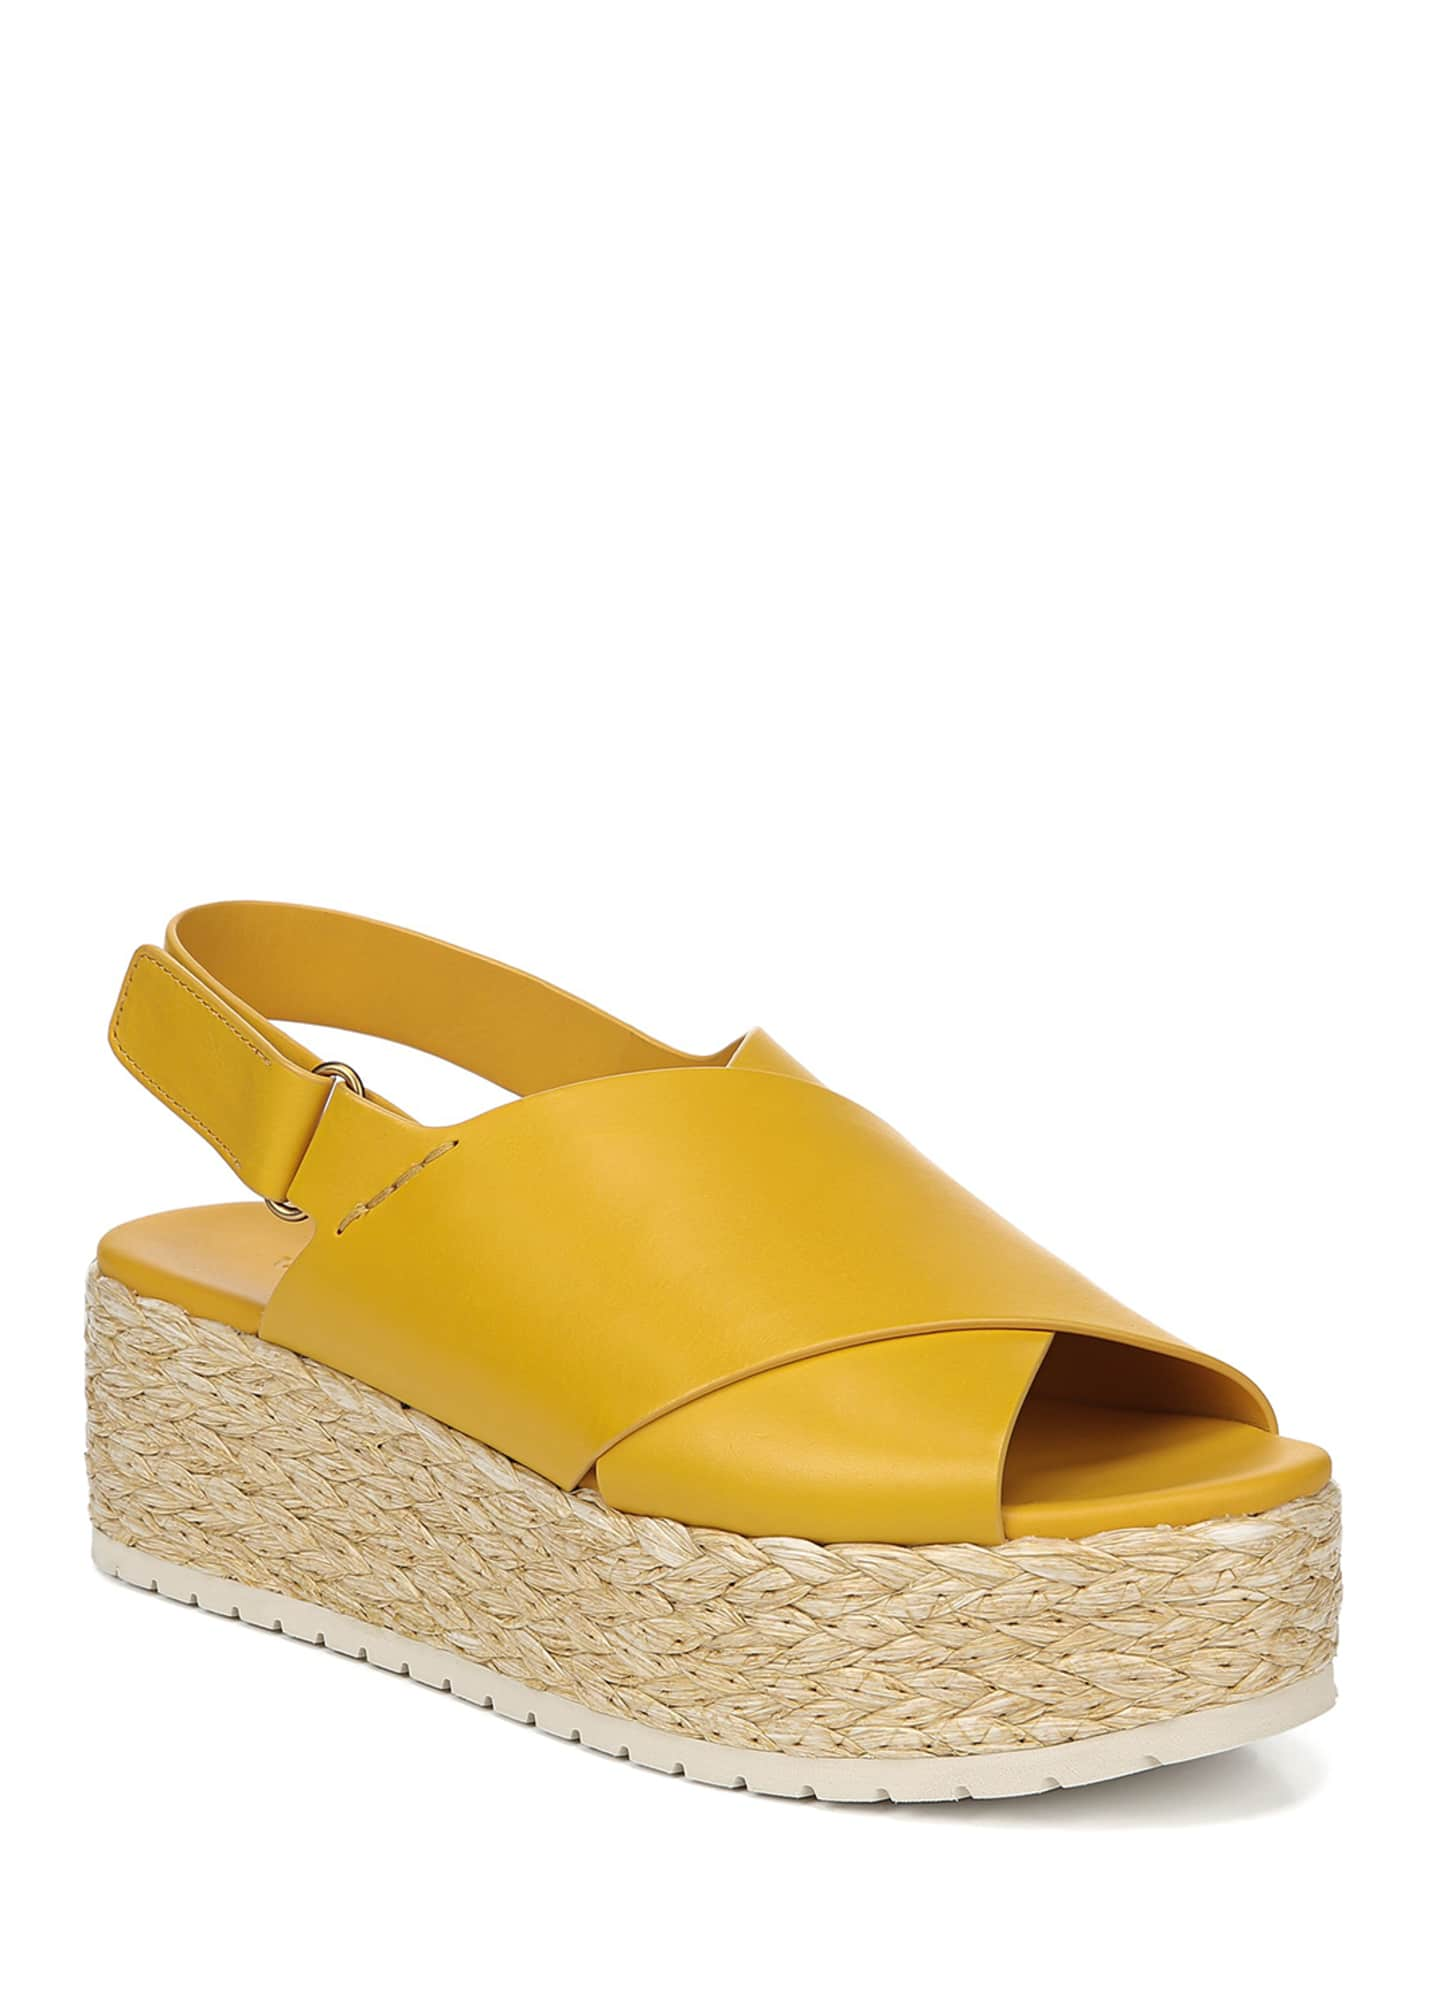 Vince Jesson Platform Espadrille Sandals